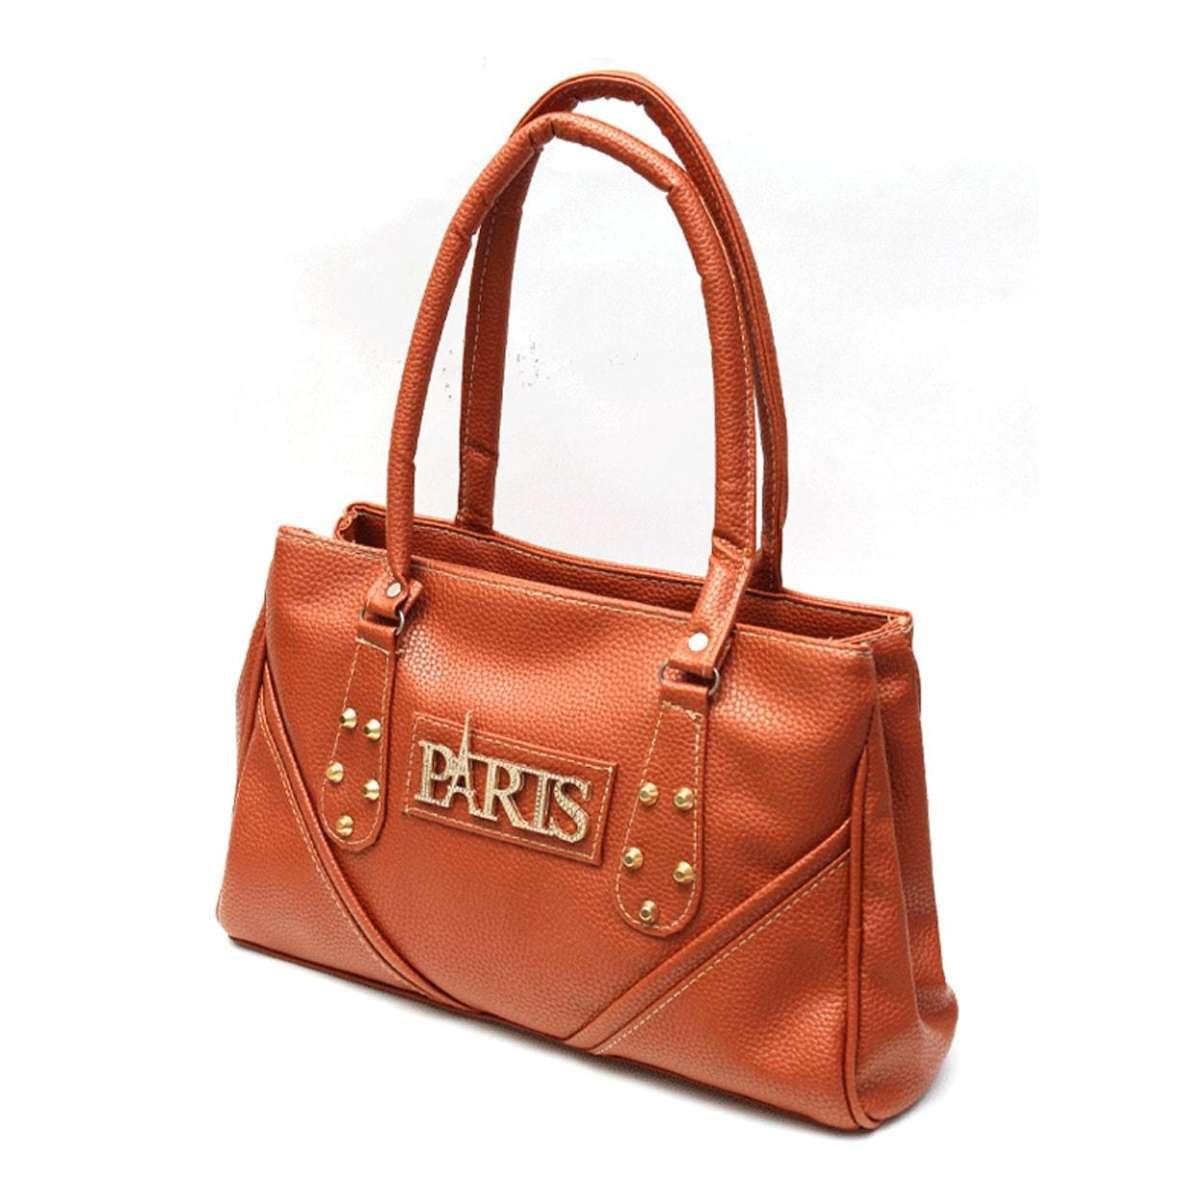 c5b6f42cf37e Buy Branded Ladies   Girls Hand Bags   Best Price in Pakistan - Daraz.pk